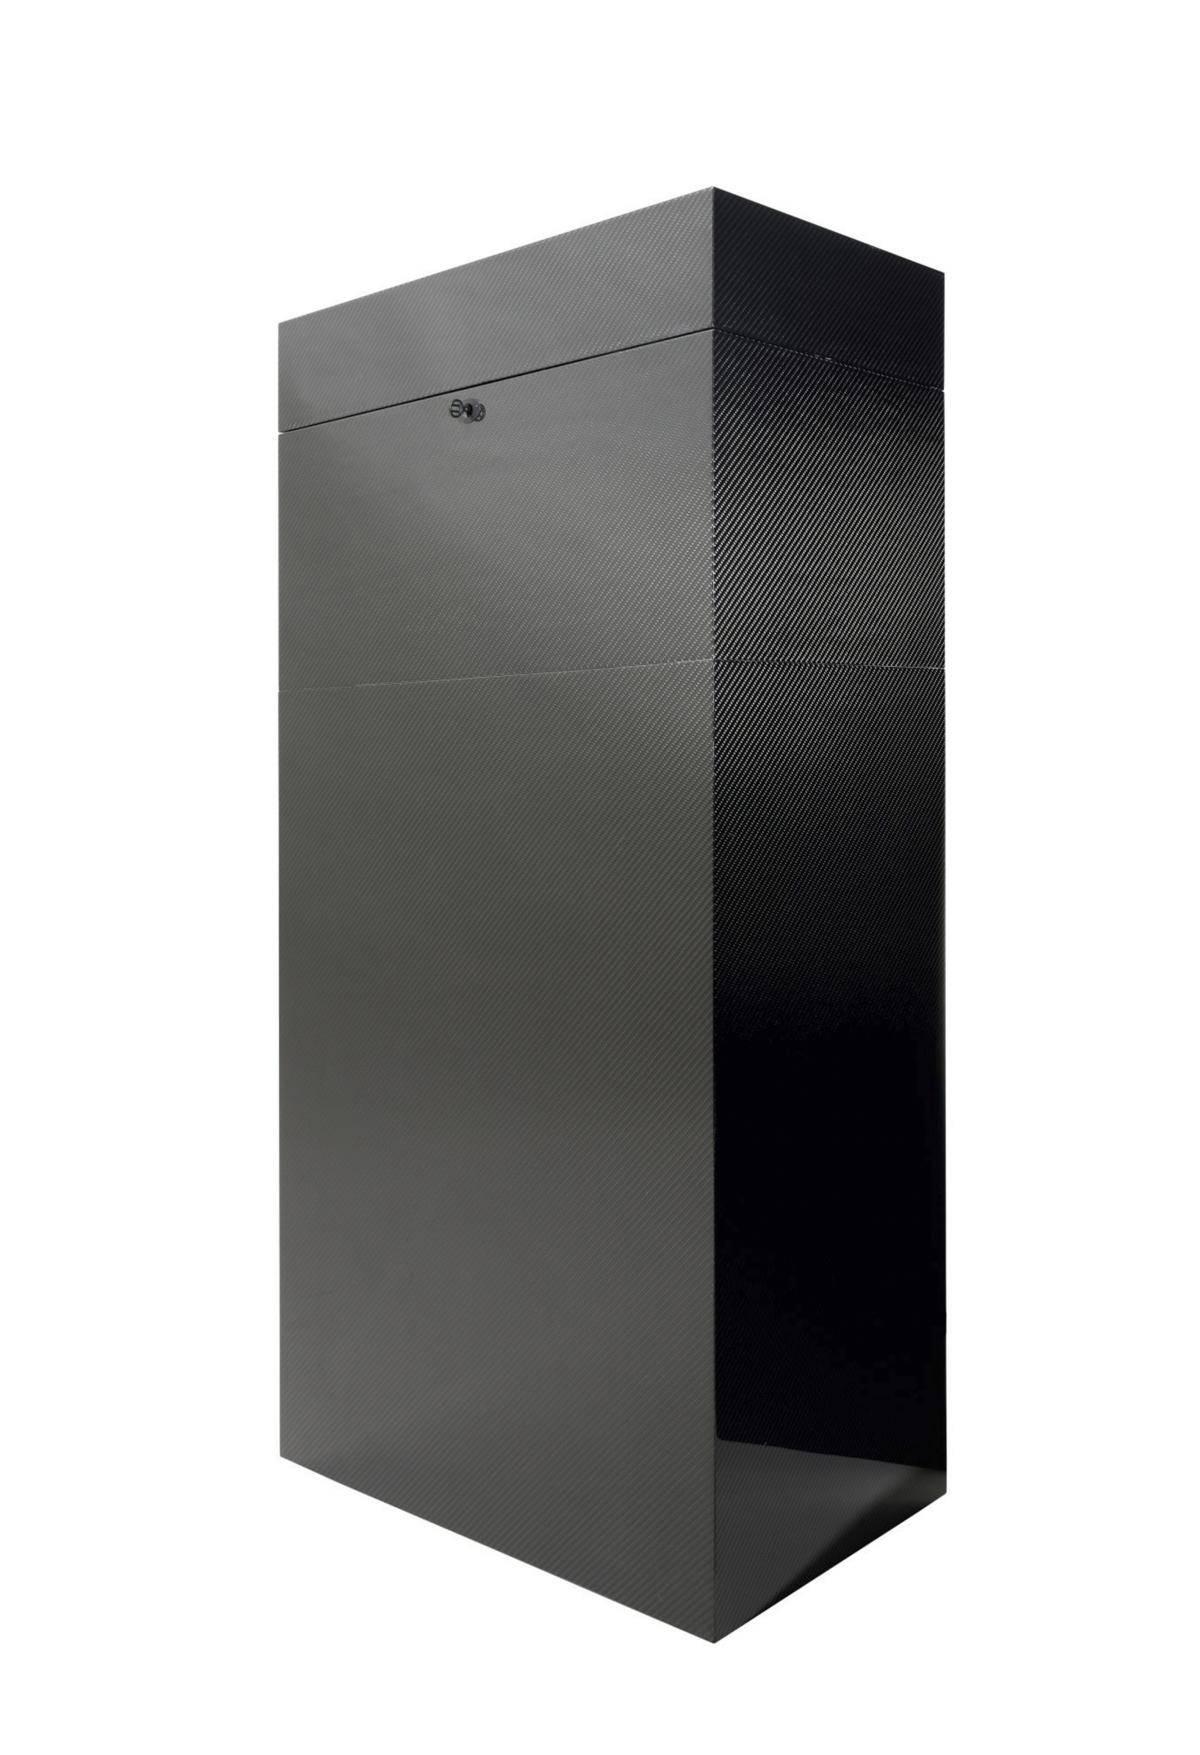 GERBER Humidor Monolith Carbon